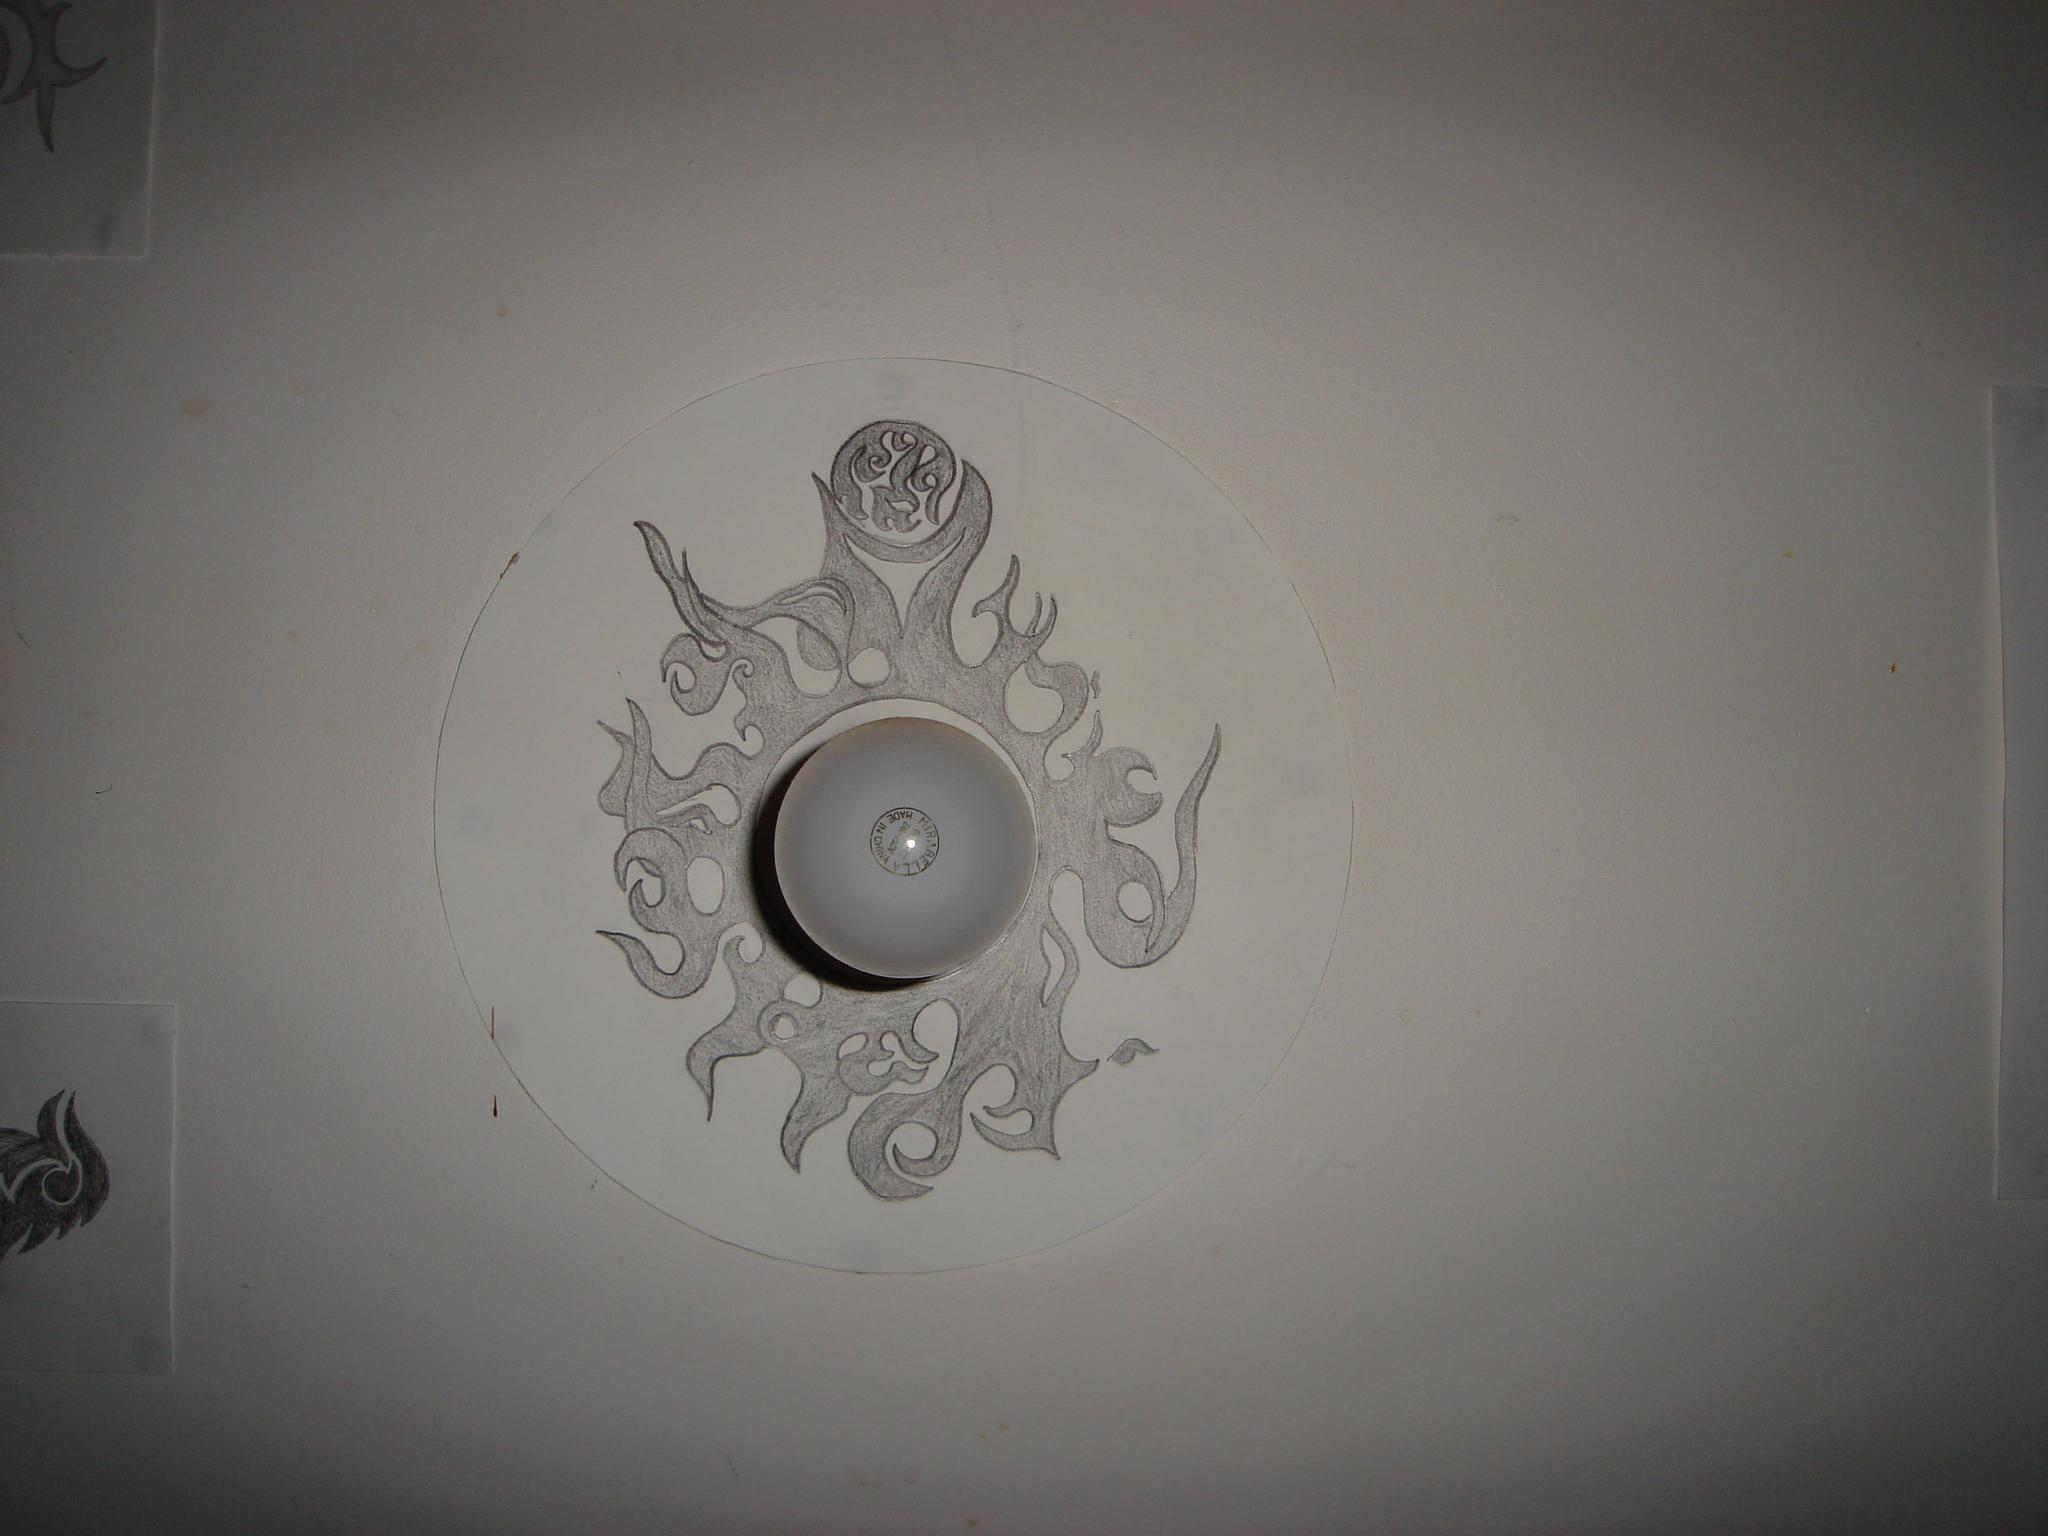 tribal tattoo eclipse by usb original on deviantart. Black Bedroom Furniture Sets. Home Design Ideas